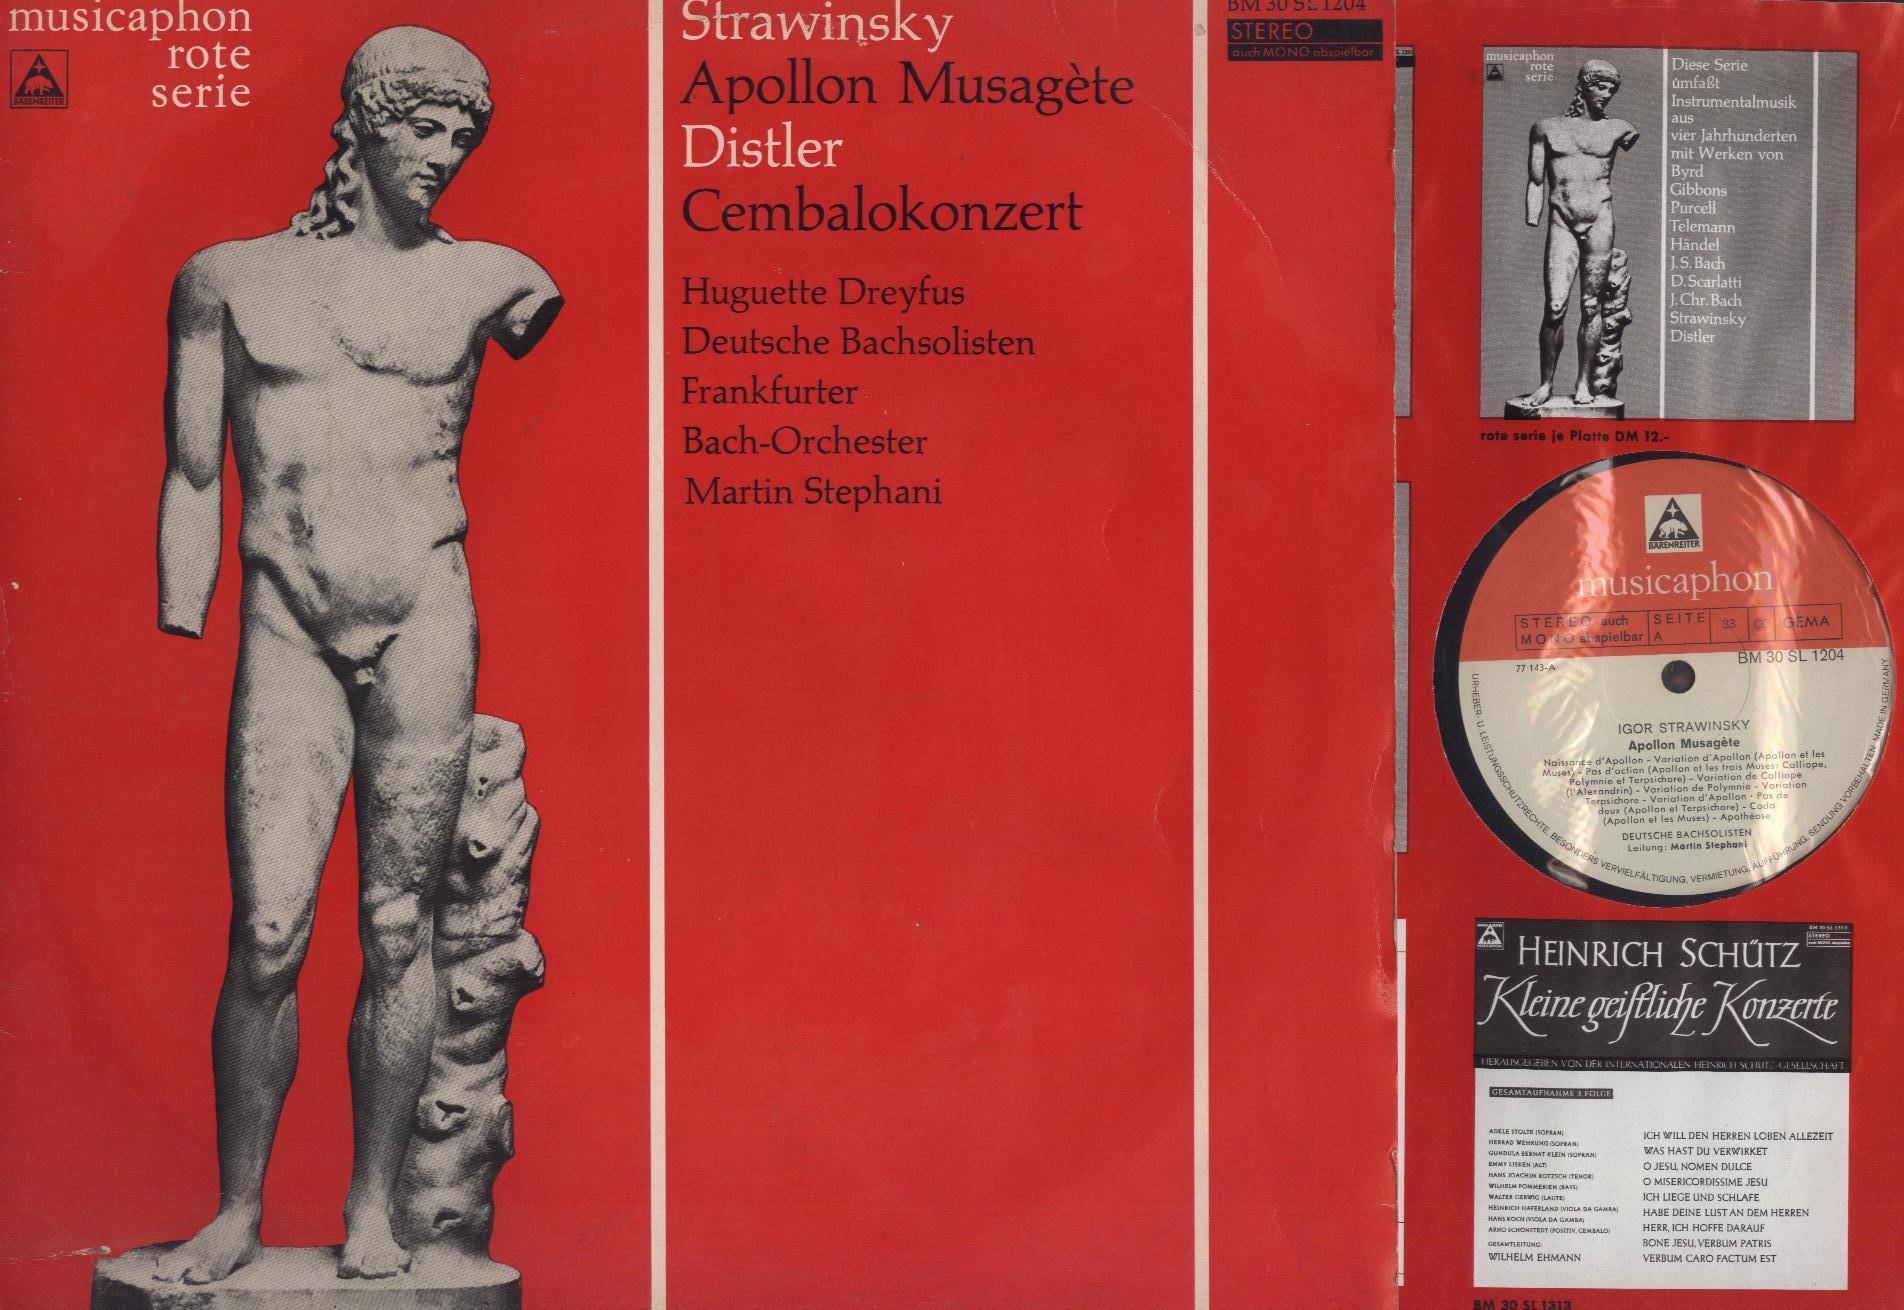 Igor Stravinsky / Hugo Distler - Huguette Dreyfus, Apollon Musagète / Cembalokonzert